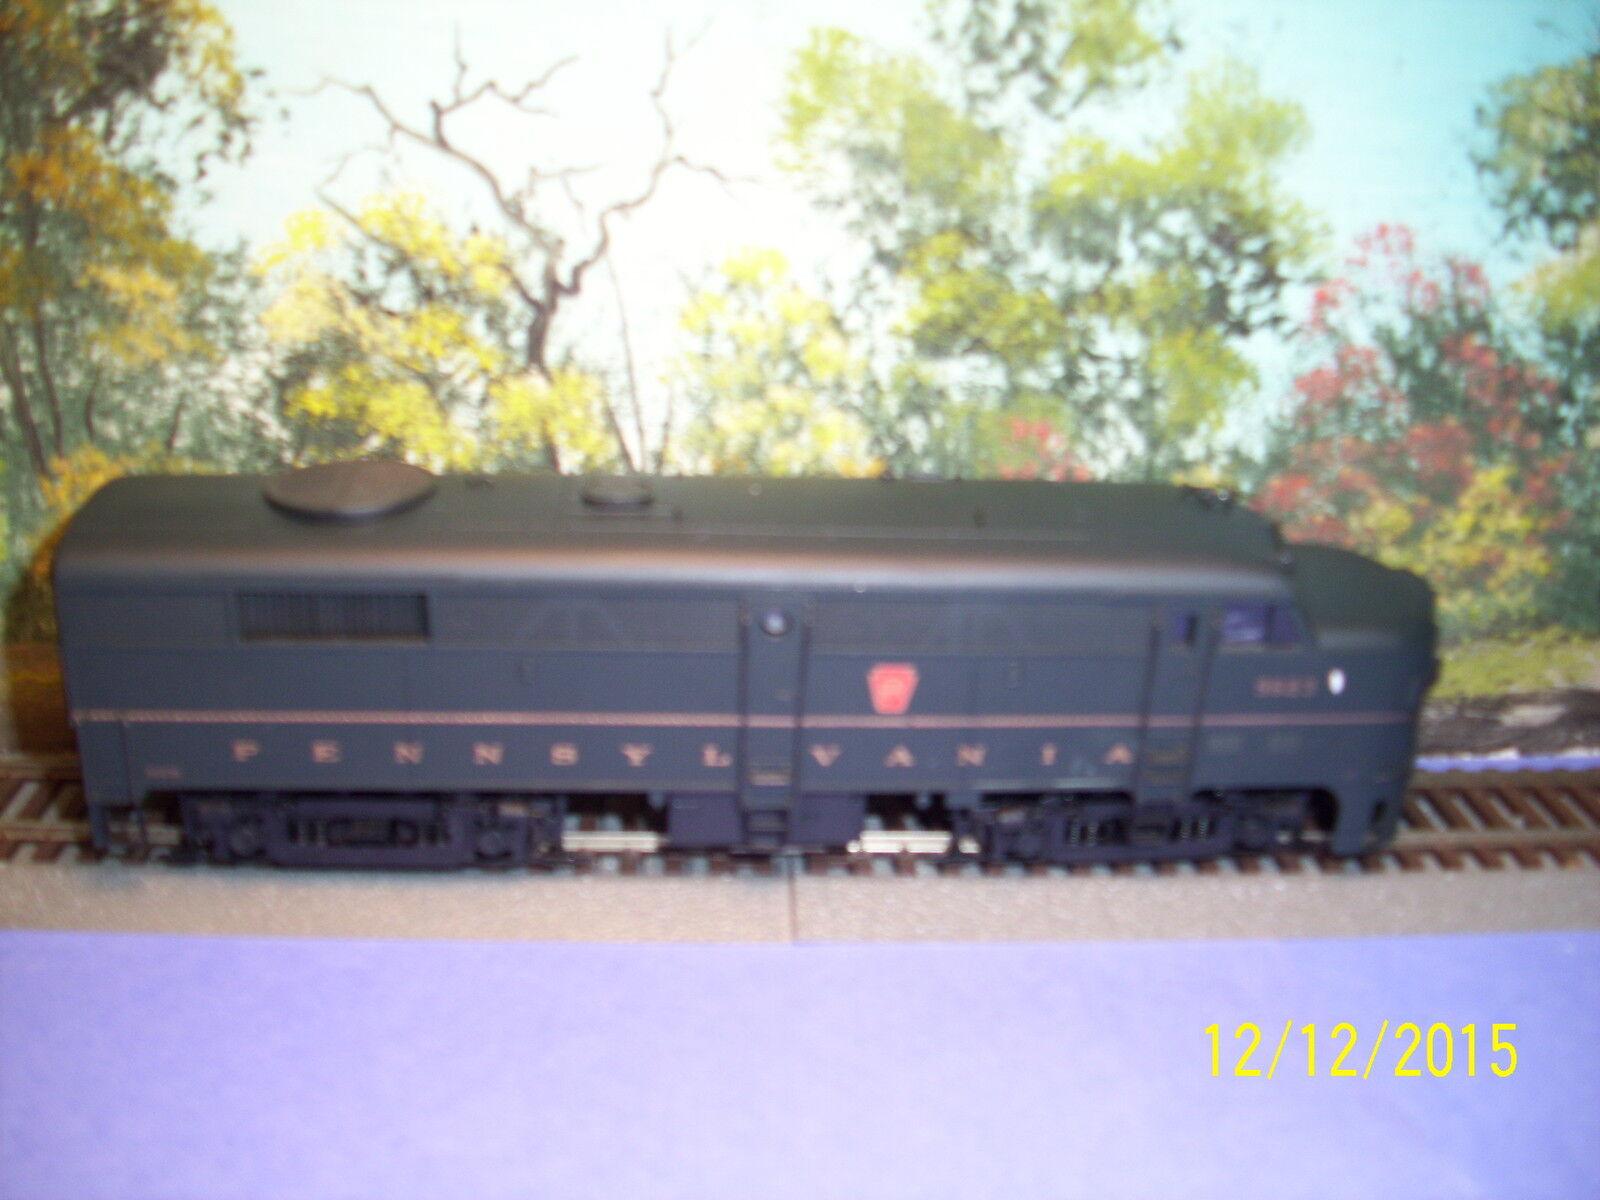 Prossoo 2000 SCALA HO  8375 FA2 Pennsylvania Railstrada  9623